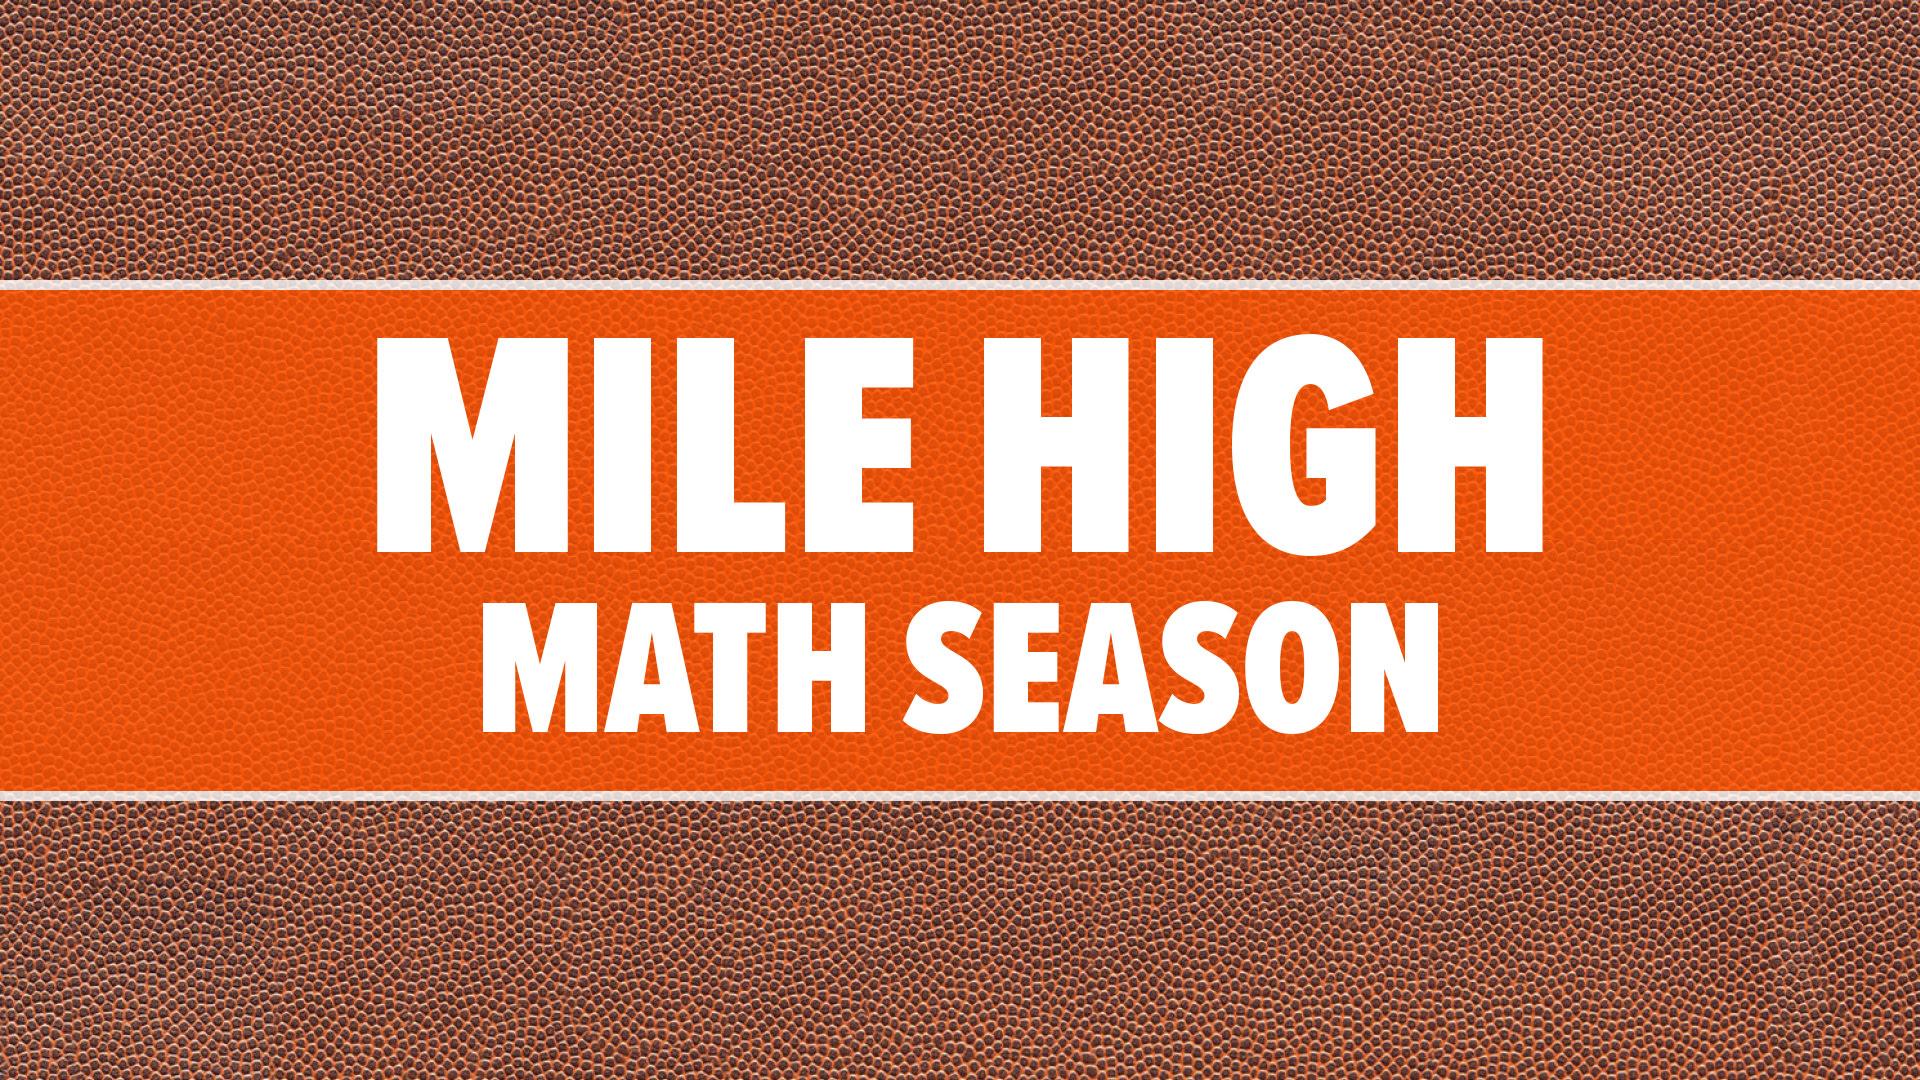 Mile High Math Season